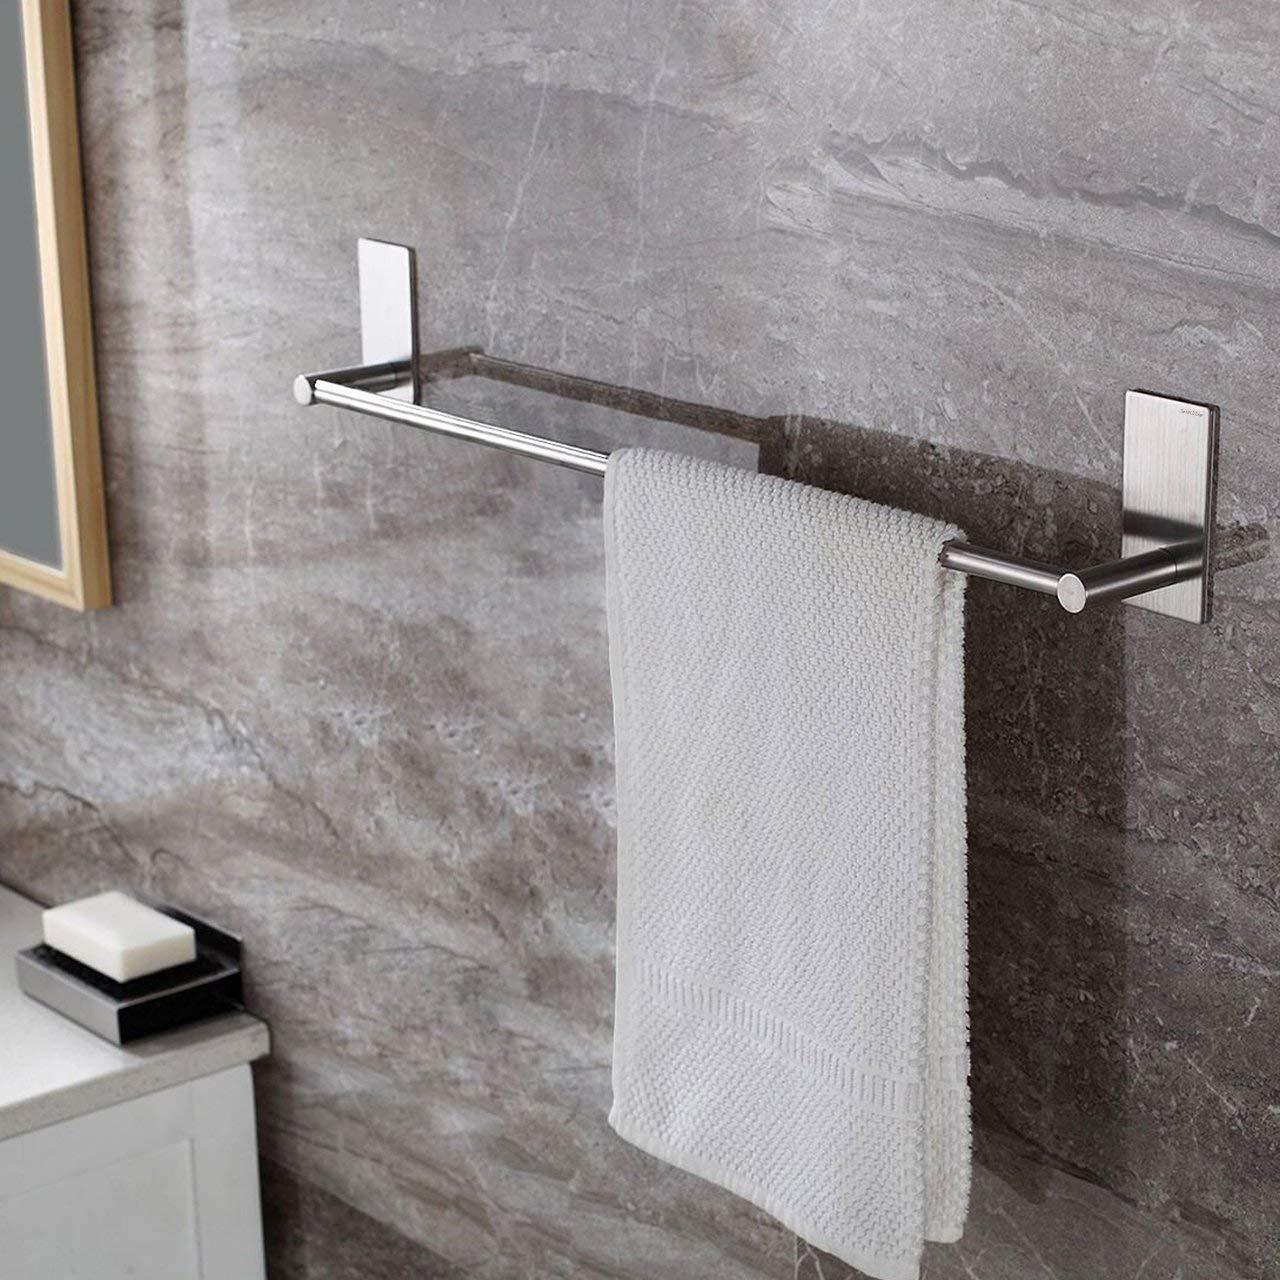 SortWise /® 22 Self Adhesive Wall Mounted Bathroom Towel Bar Brushed Stainless Steel Towel Racks Bath Towel Holder for Bathroom or Kitchen